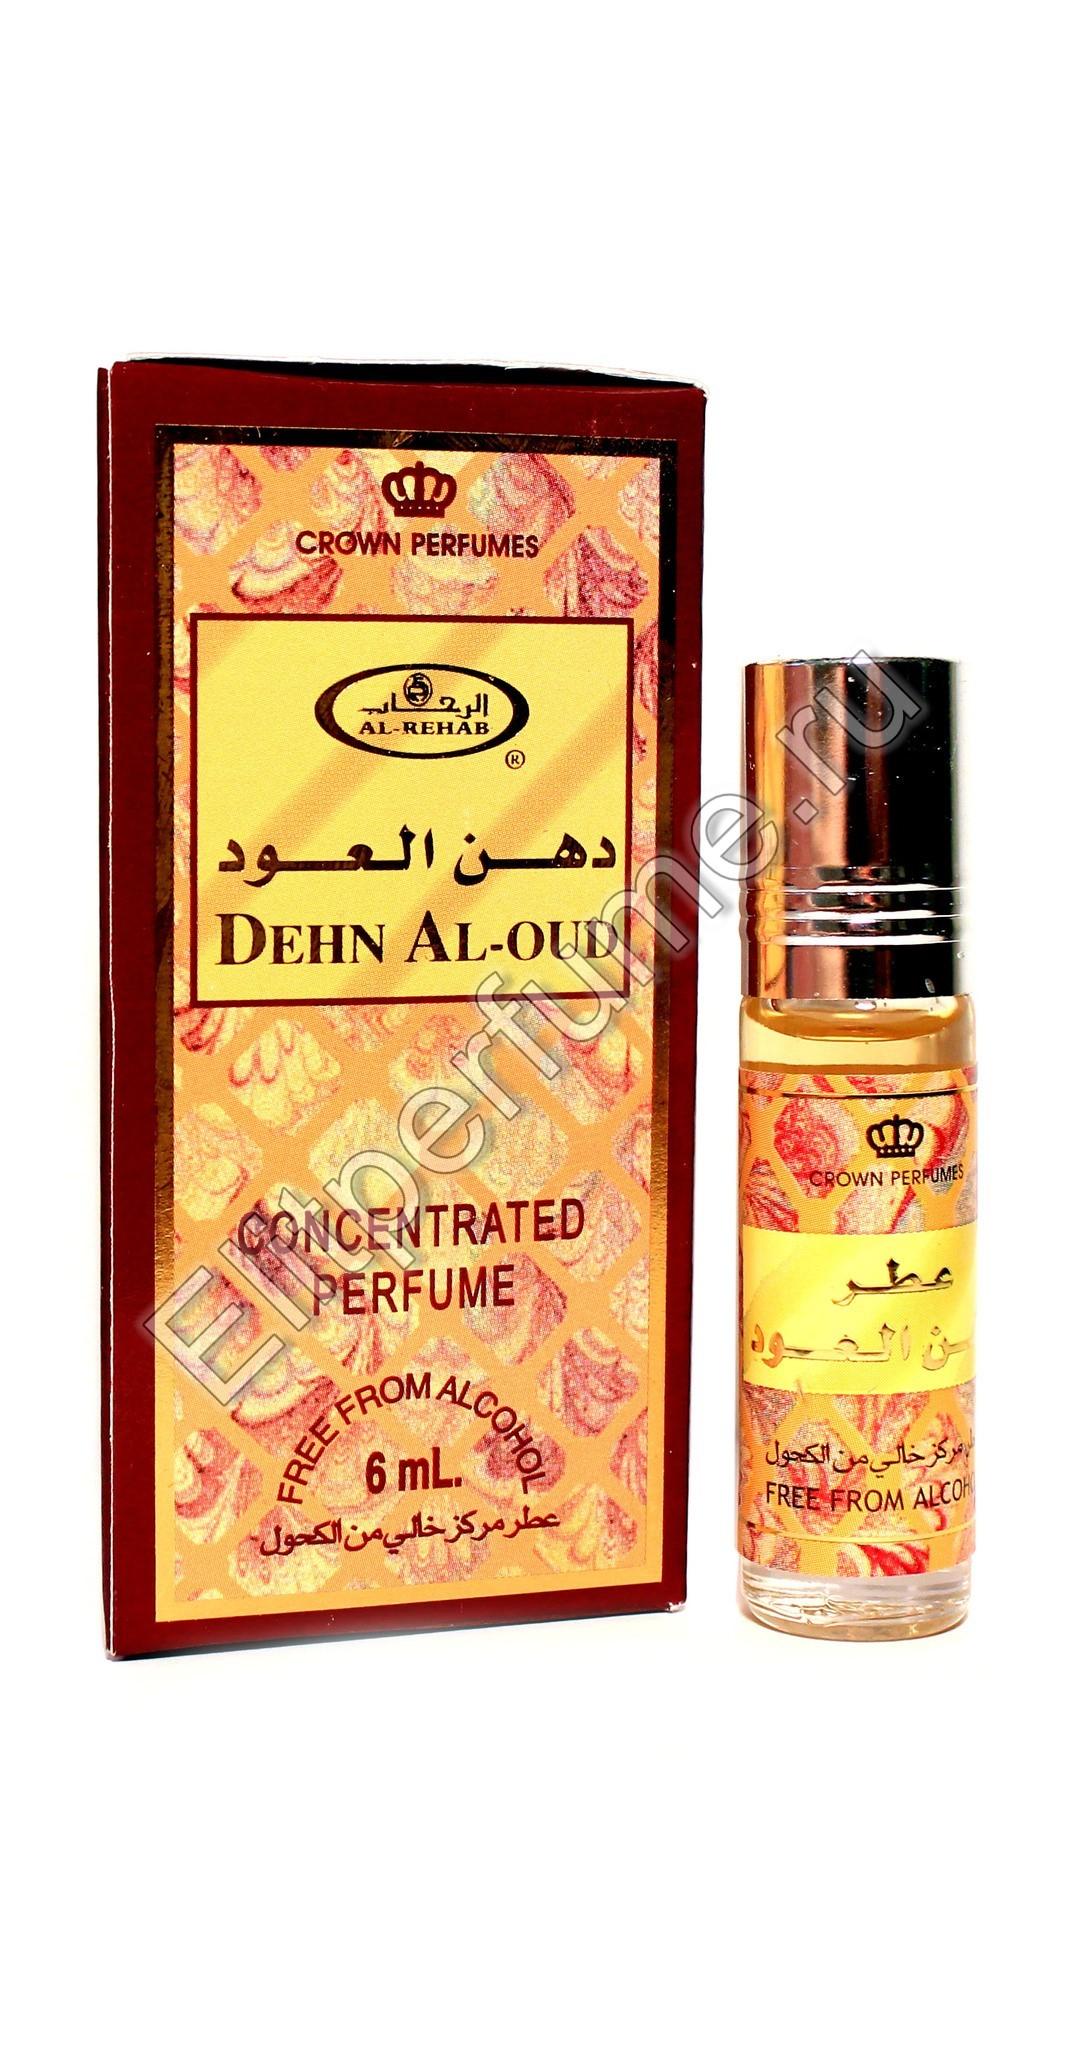 Dehn Al Oud Ден Аль Оуд 6 мл арабские мужские масляные духи от Аль Рехаб Al Rehab